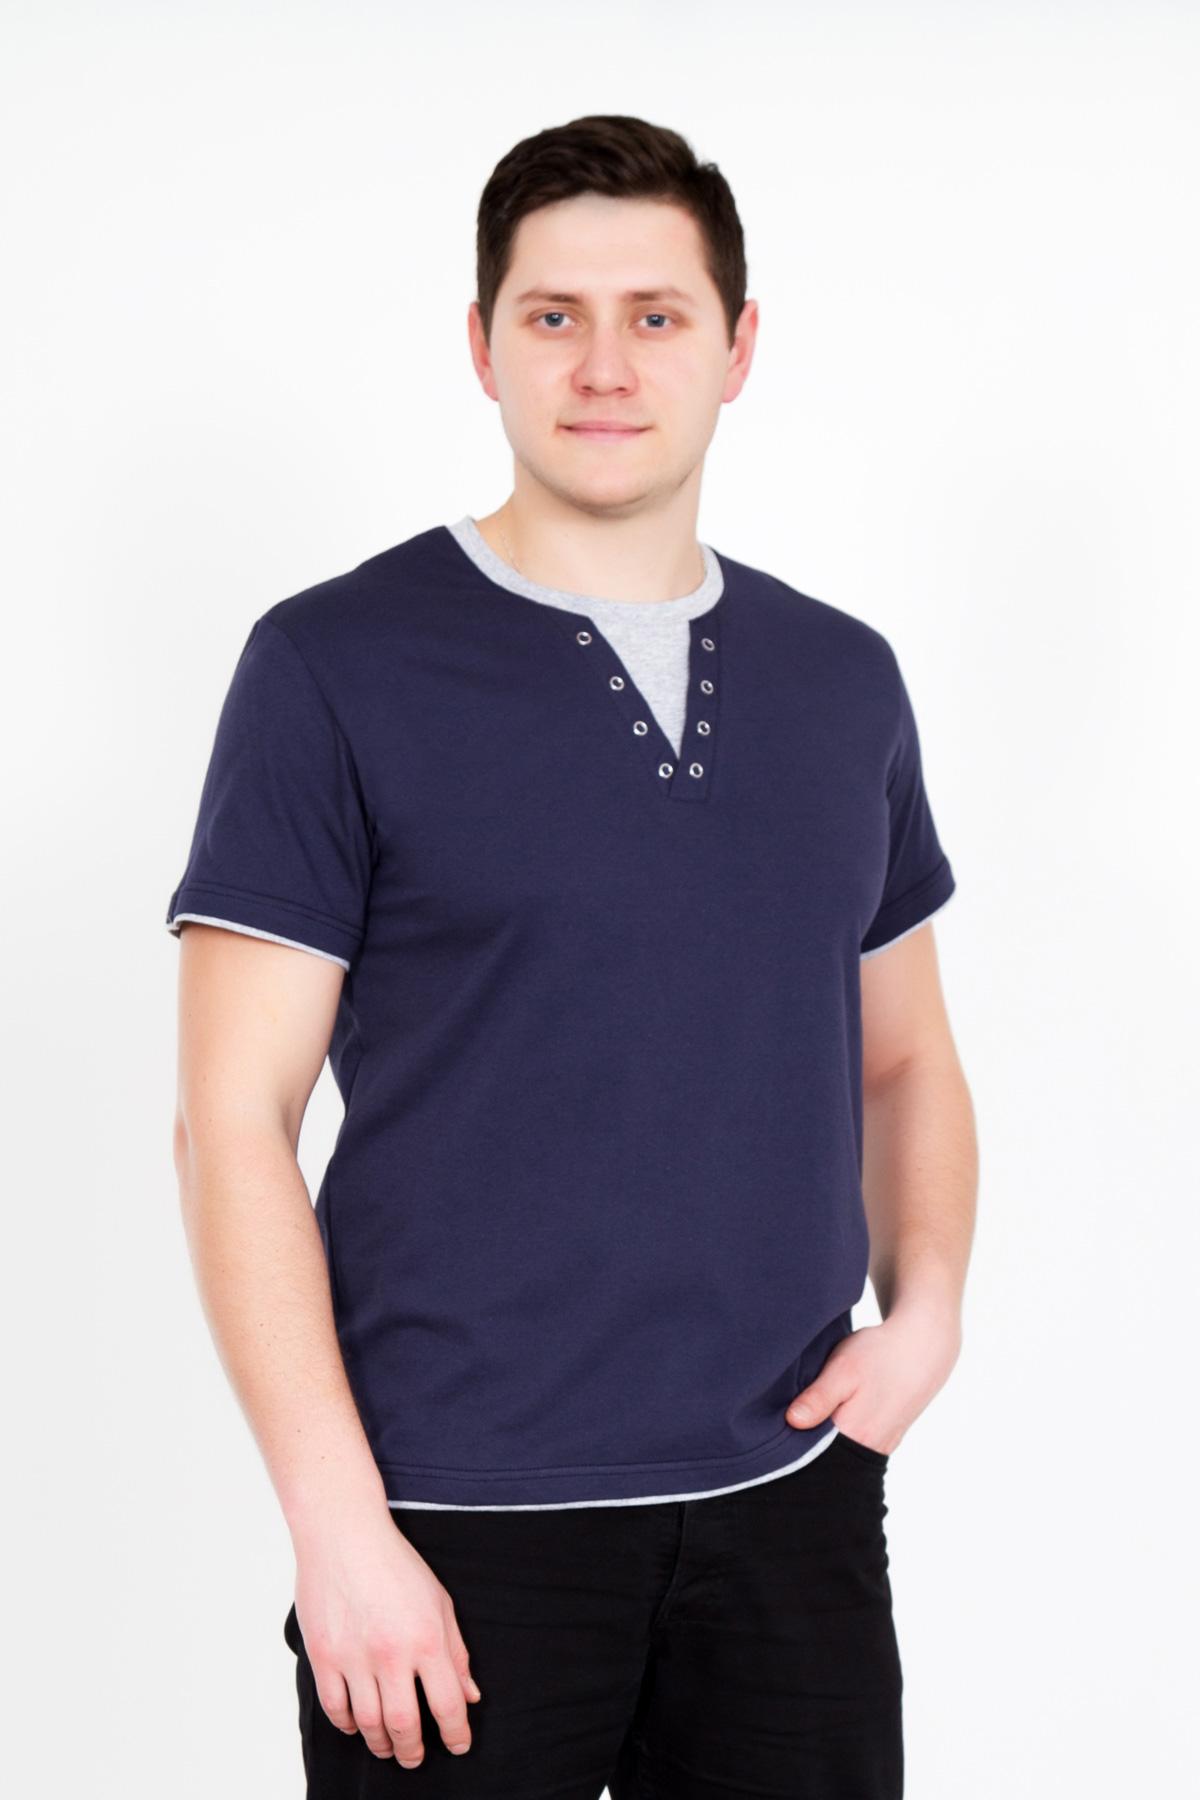 Муж. футболка Джон Синий р. 64Майки и футболки<br>Факт. ОГ: 128 см <br>Факт. ОТ: 128 см <br>Факт. ОБ: 130 см <br>Длина по спинке: 76 см<br><br>Тип: Муж. футболка<br>Размер: 64<br>Материал: Кулирка